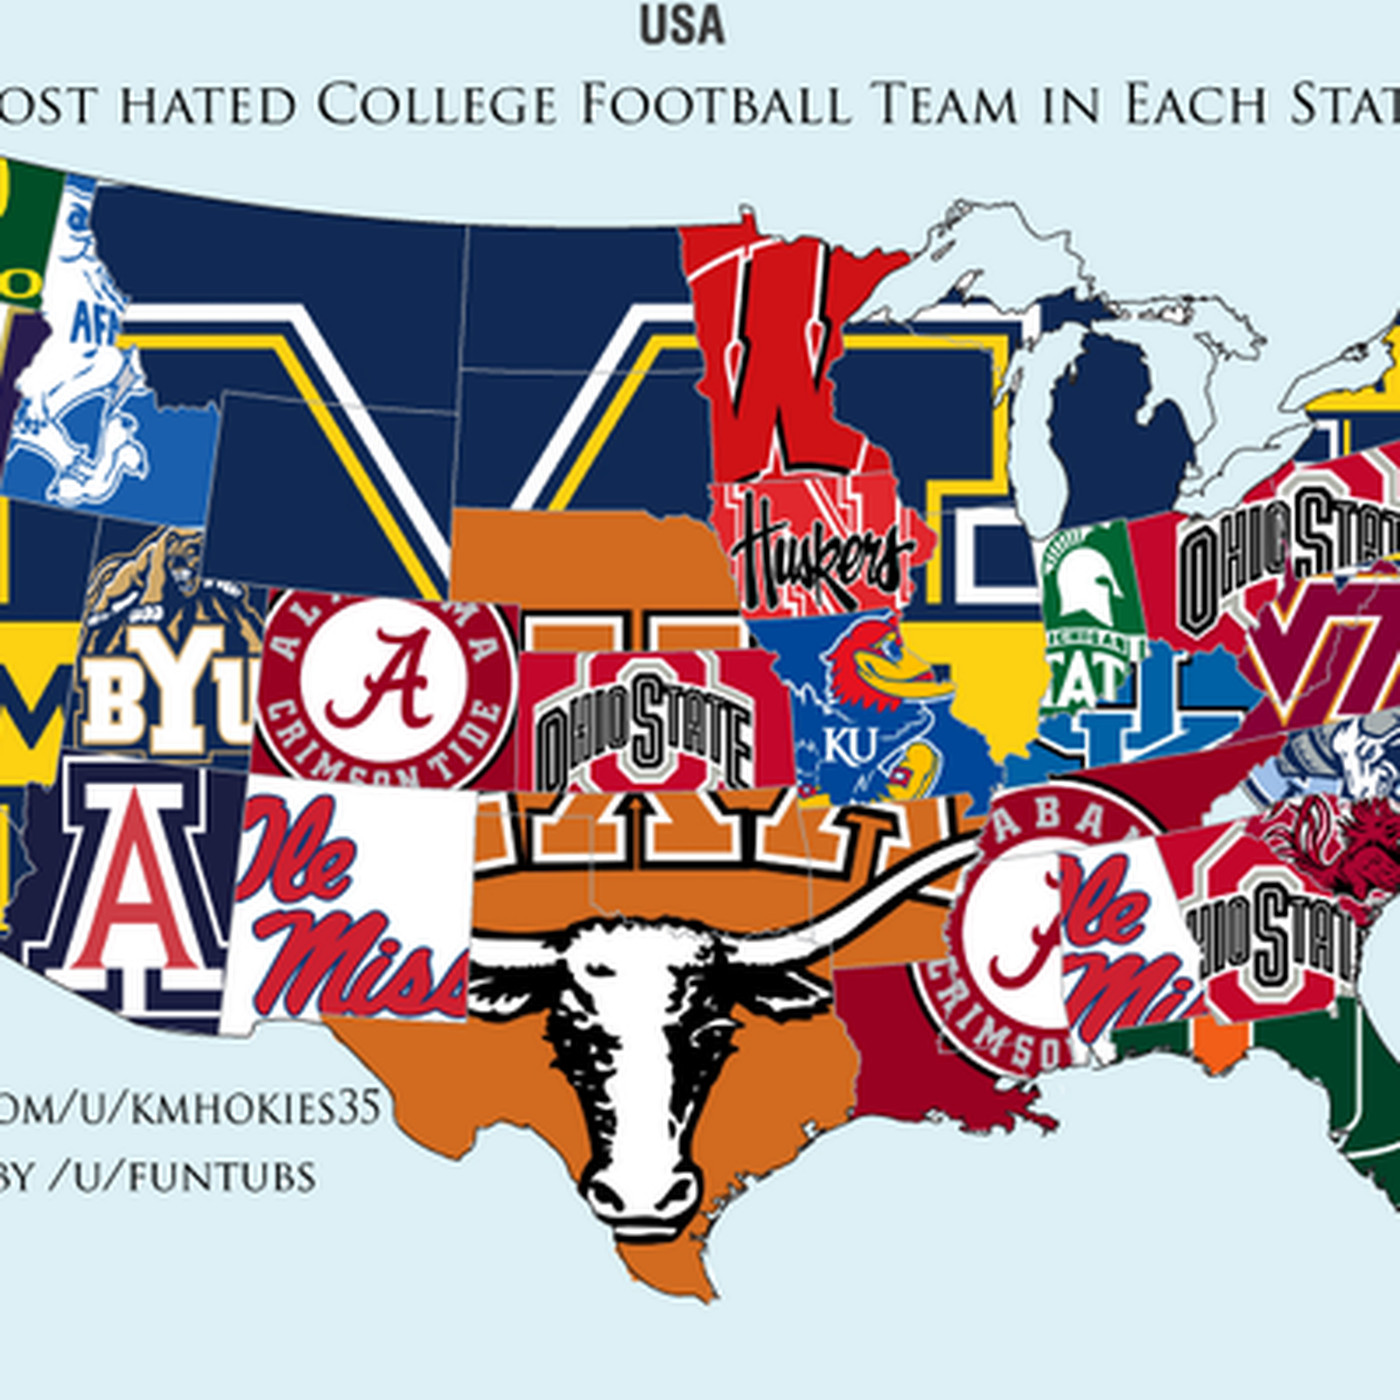 College Football Hate Map: Texas Hates Texas - Good Bull Hunting